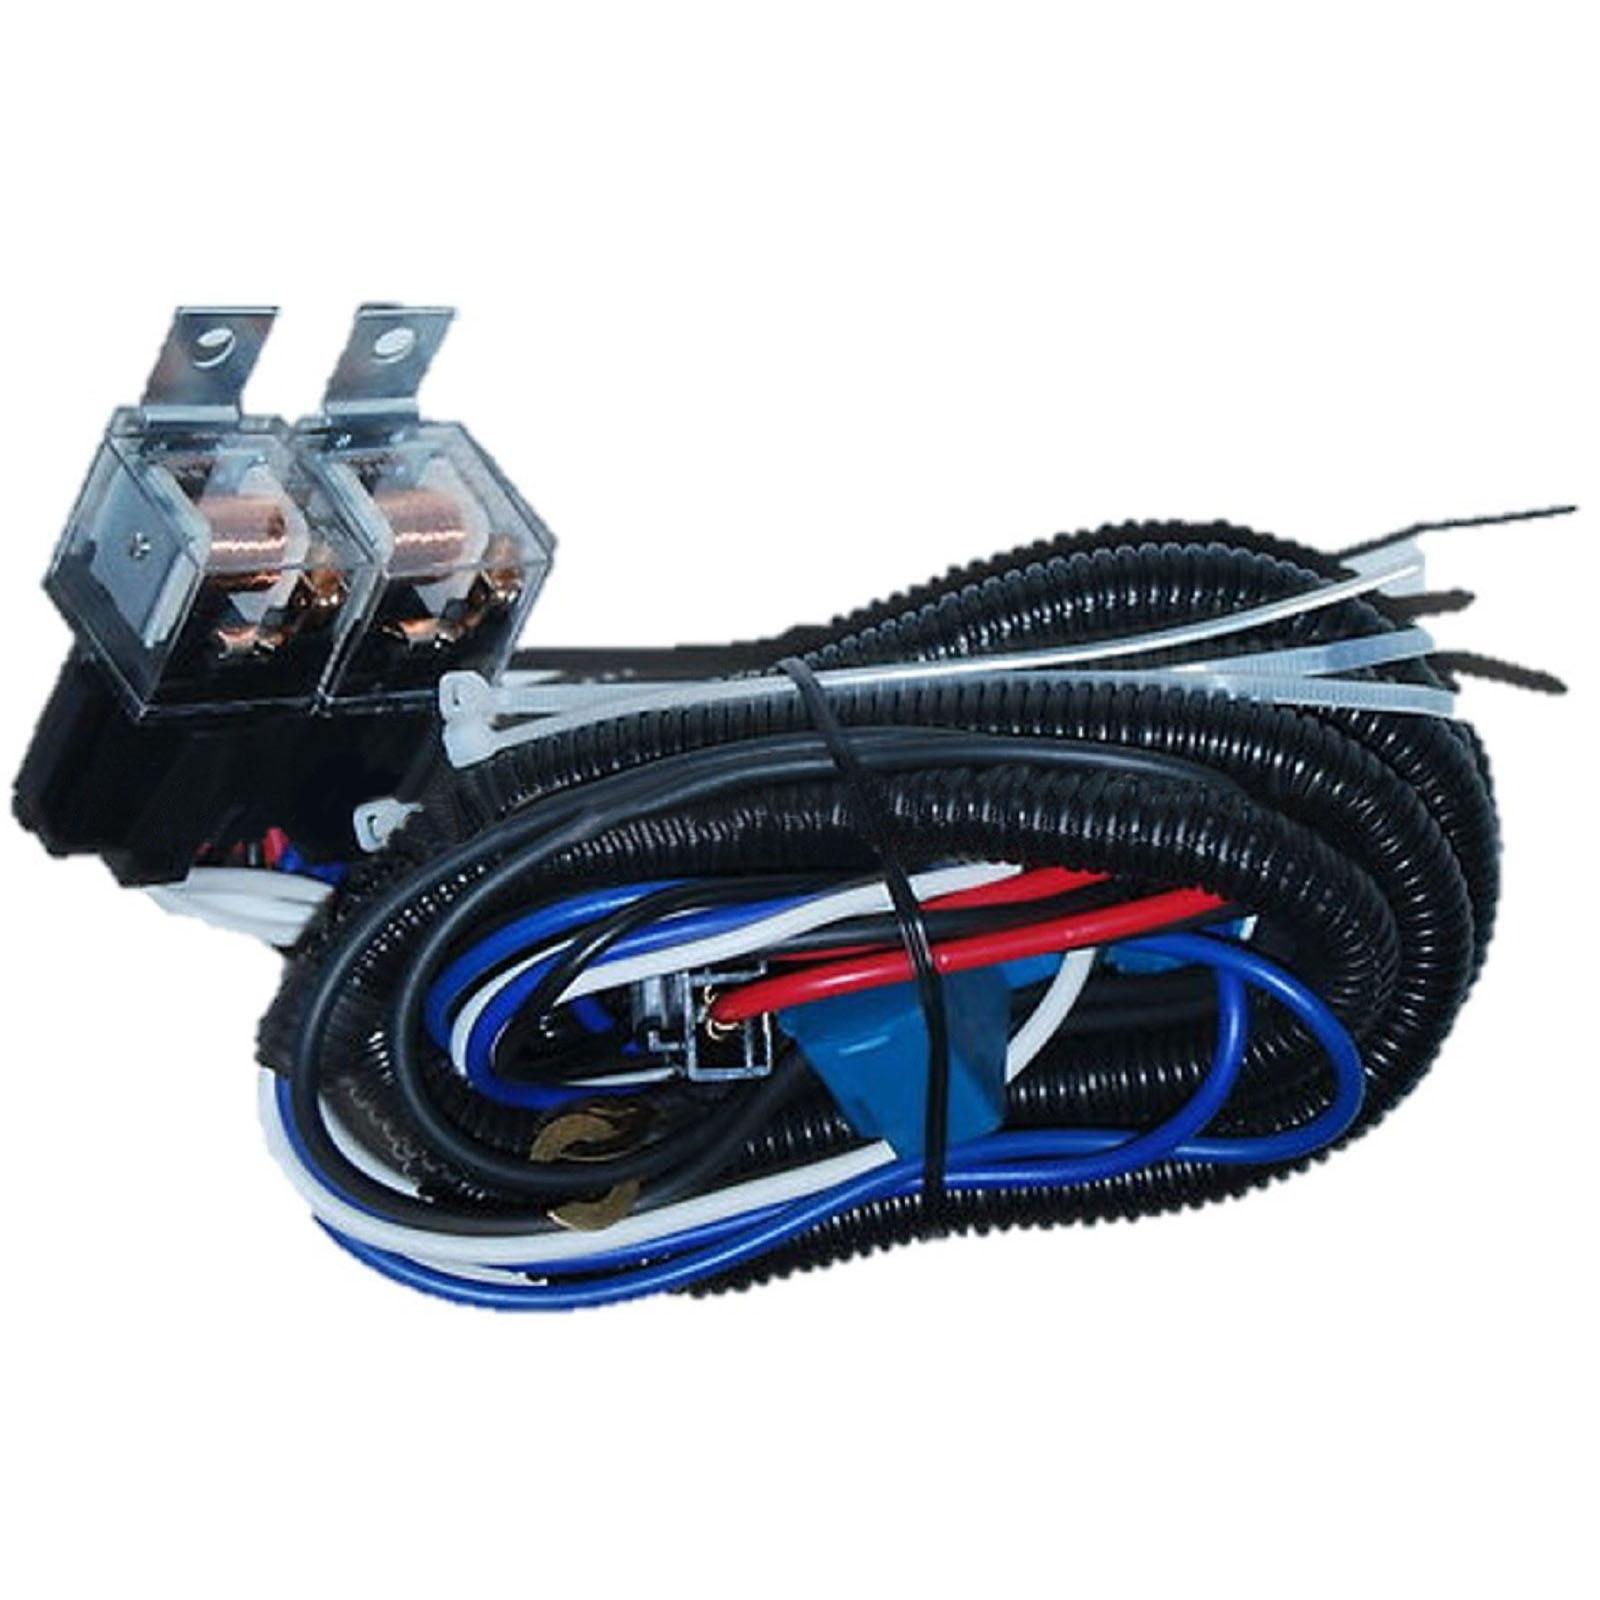 Ceramic H4 Headlight 4 Headlamp Light Bulb Socket Plug Relay Wiring Accessory Harness 4x6